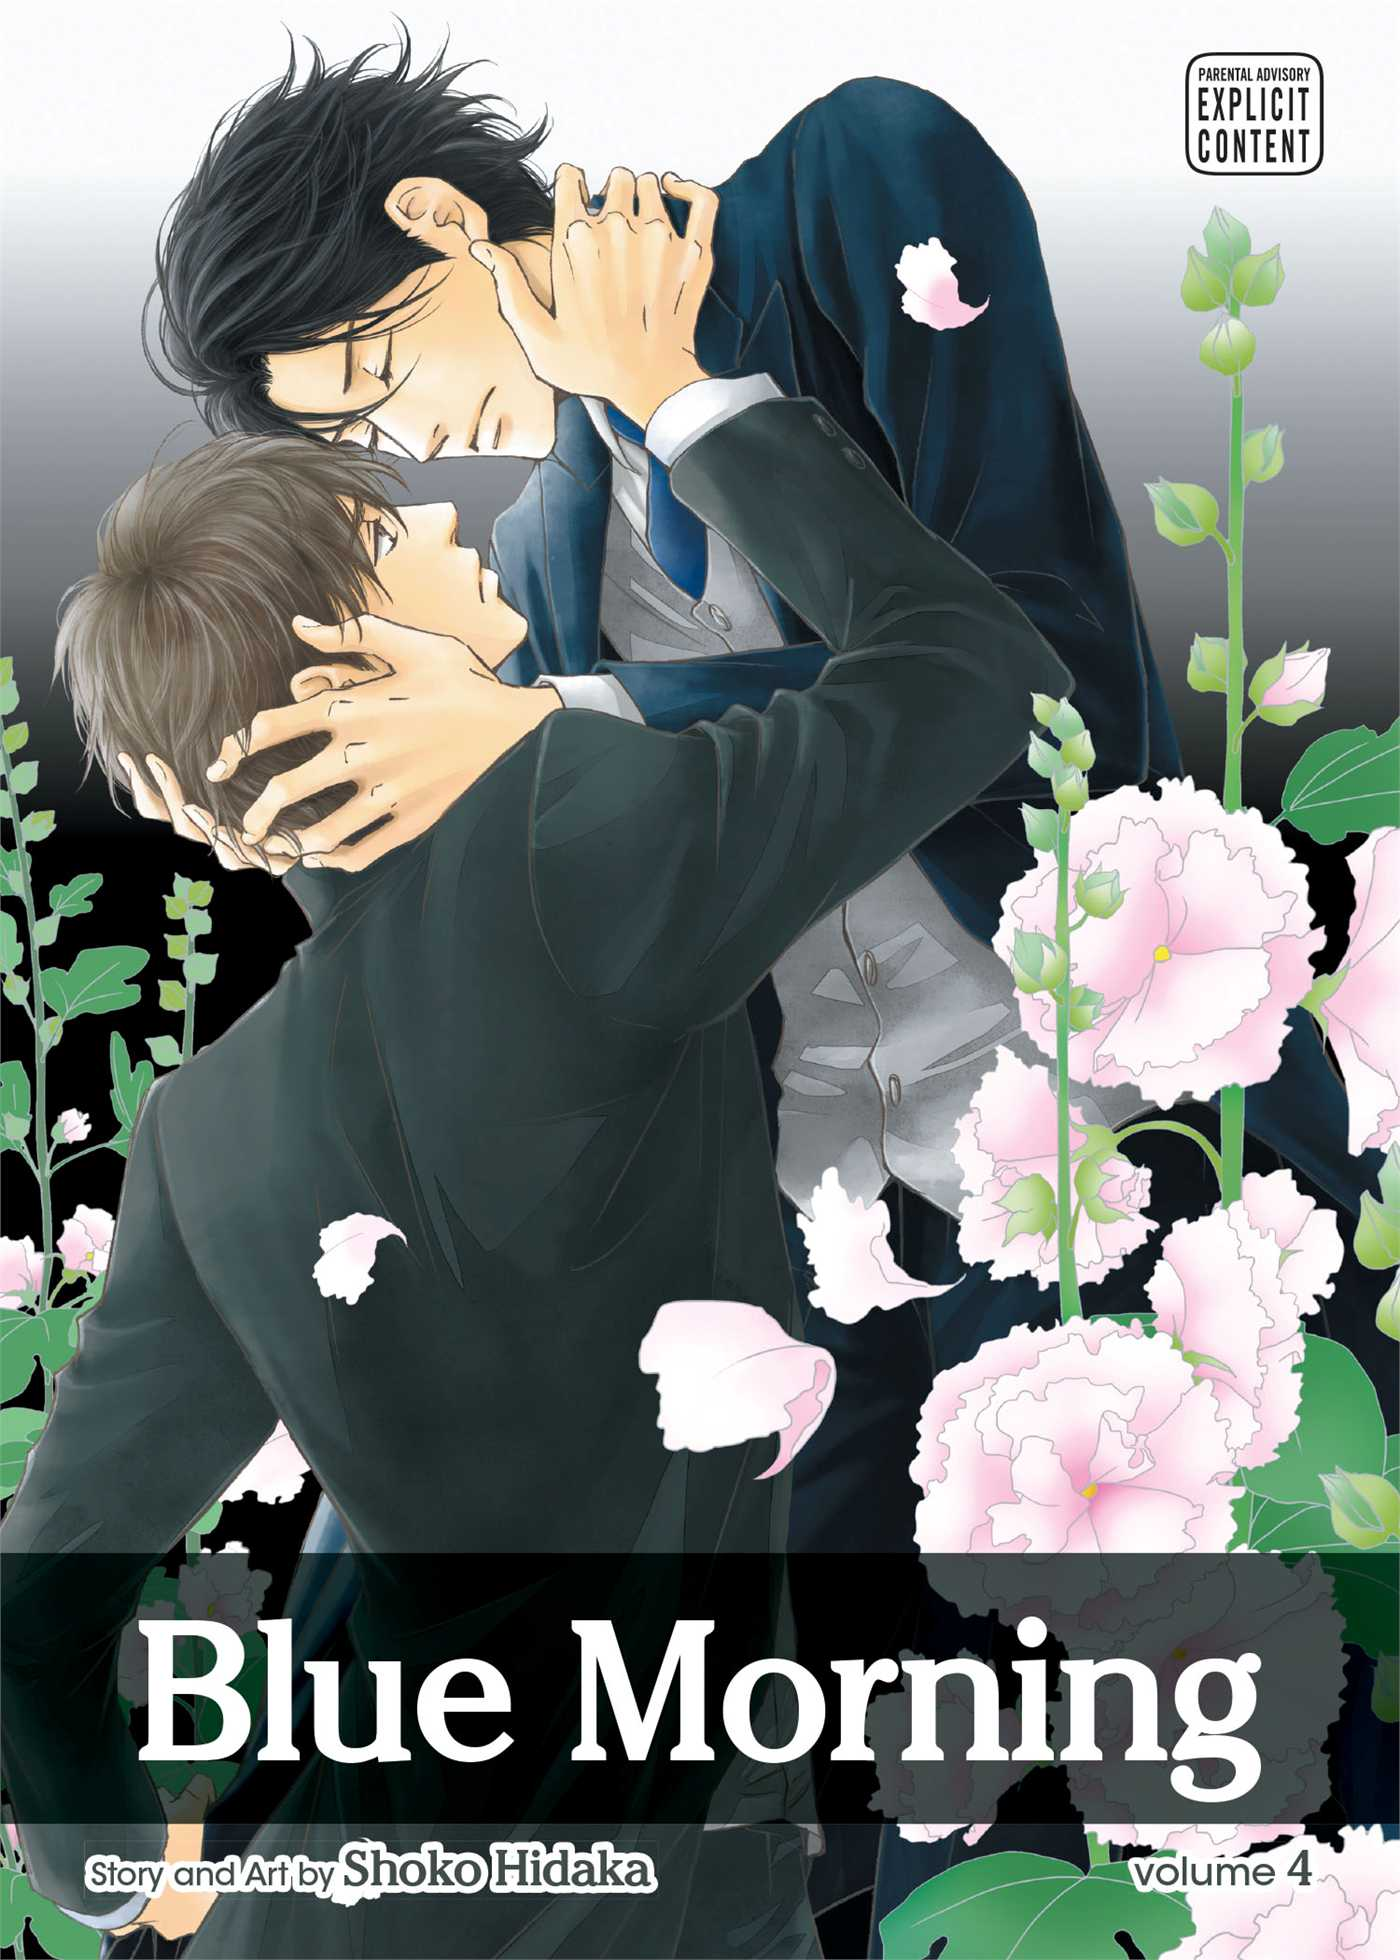 Blue morning vol 4 9781421555553 hr